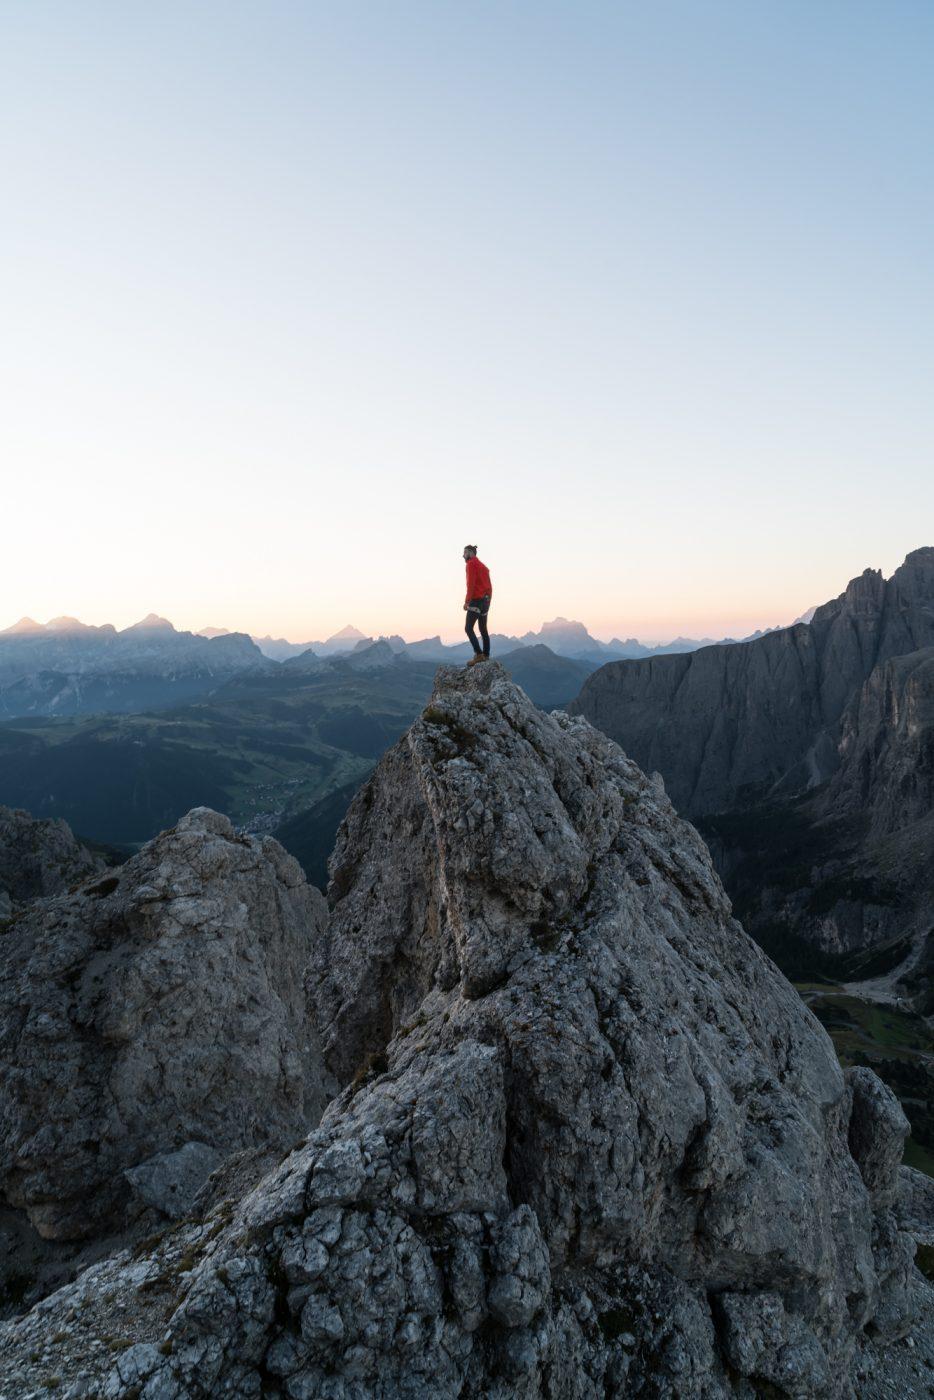 Gran Cir, Dolomites, South Tyrol, Italy